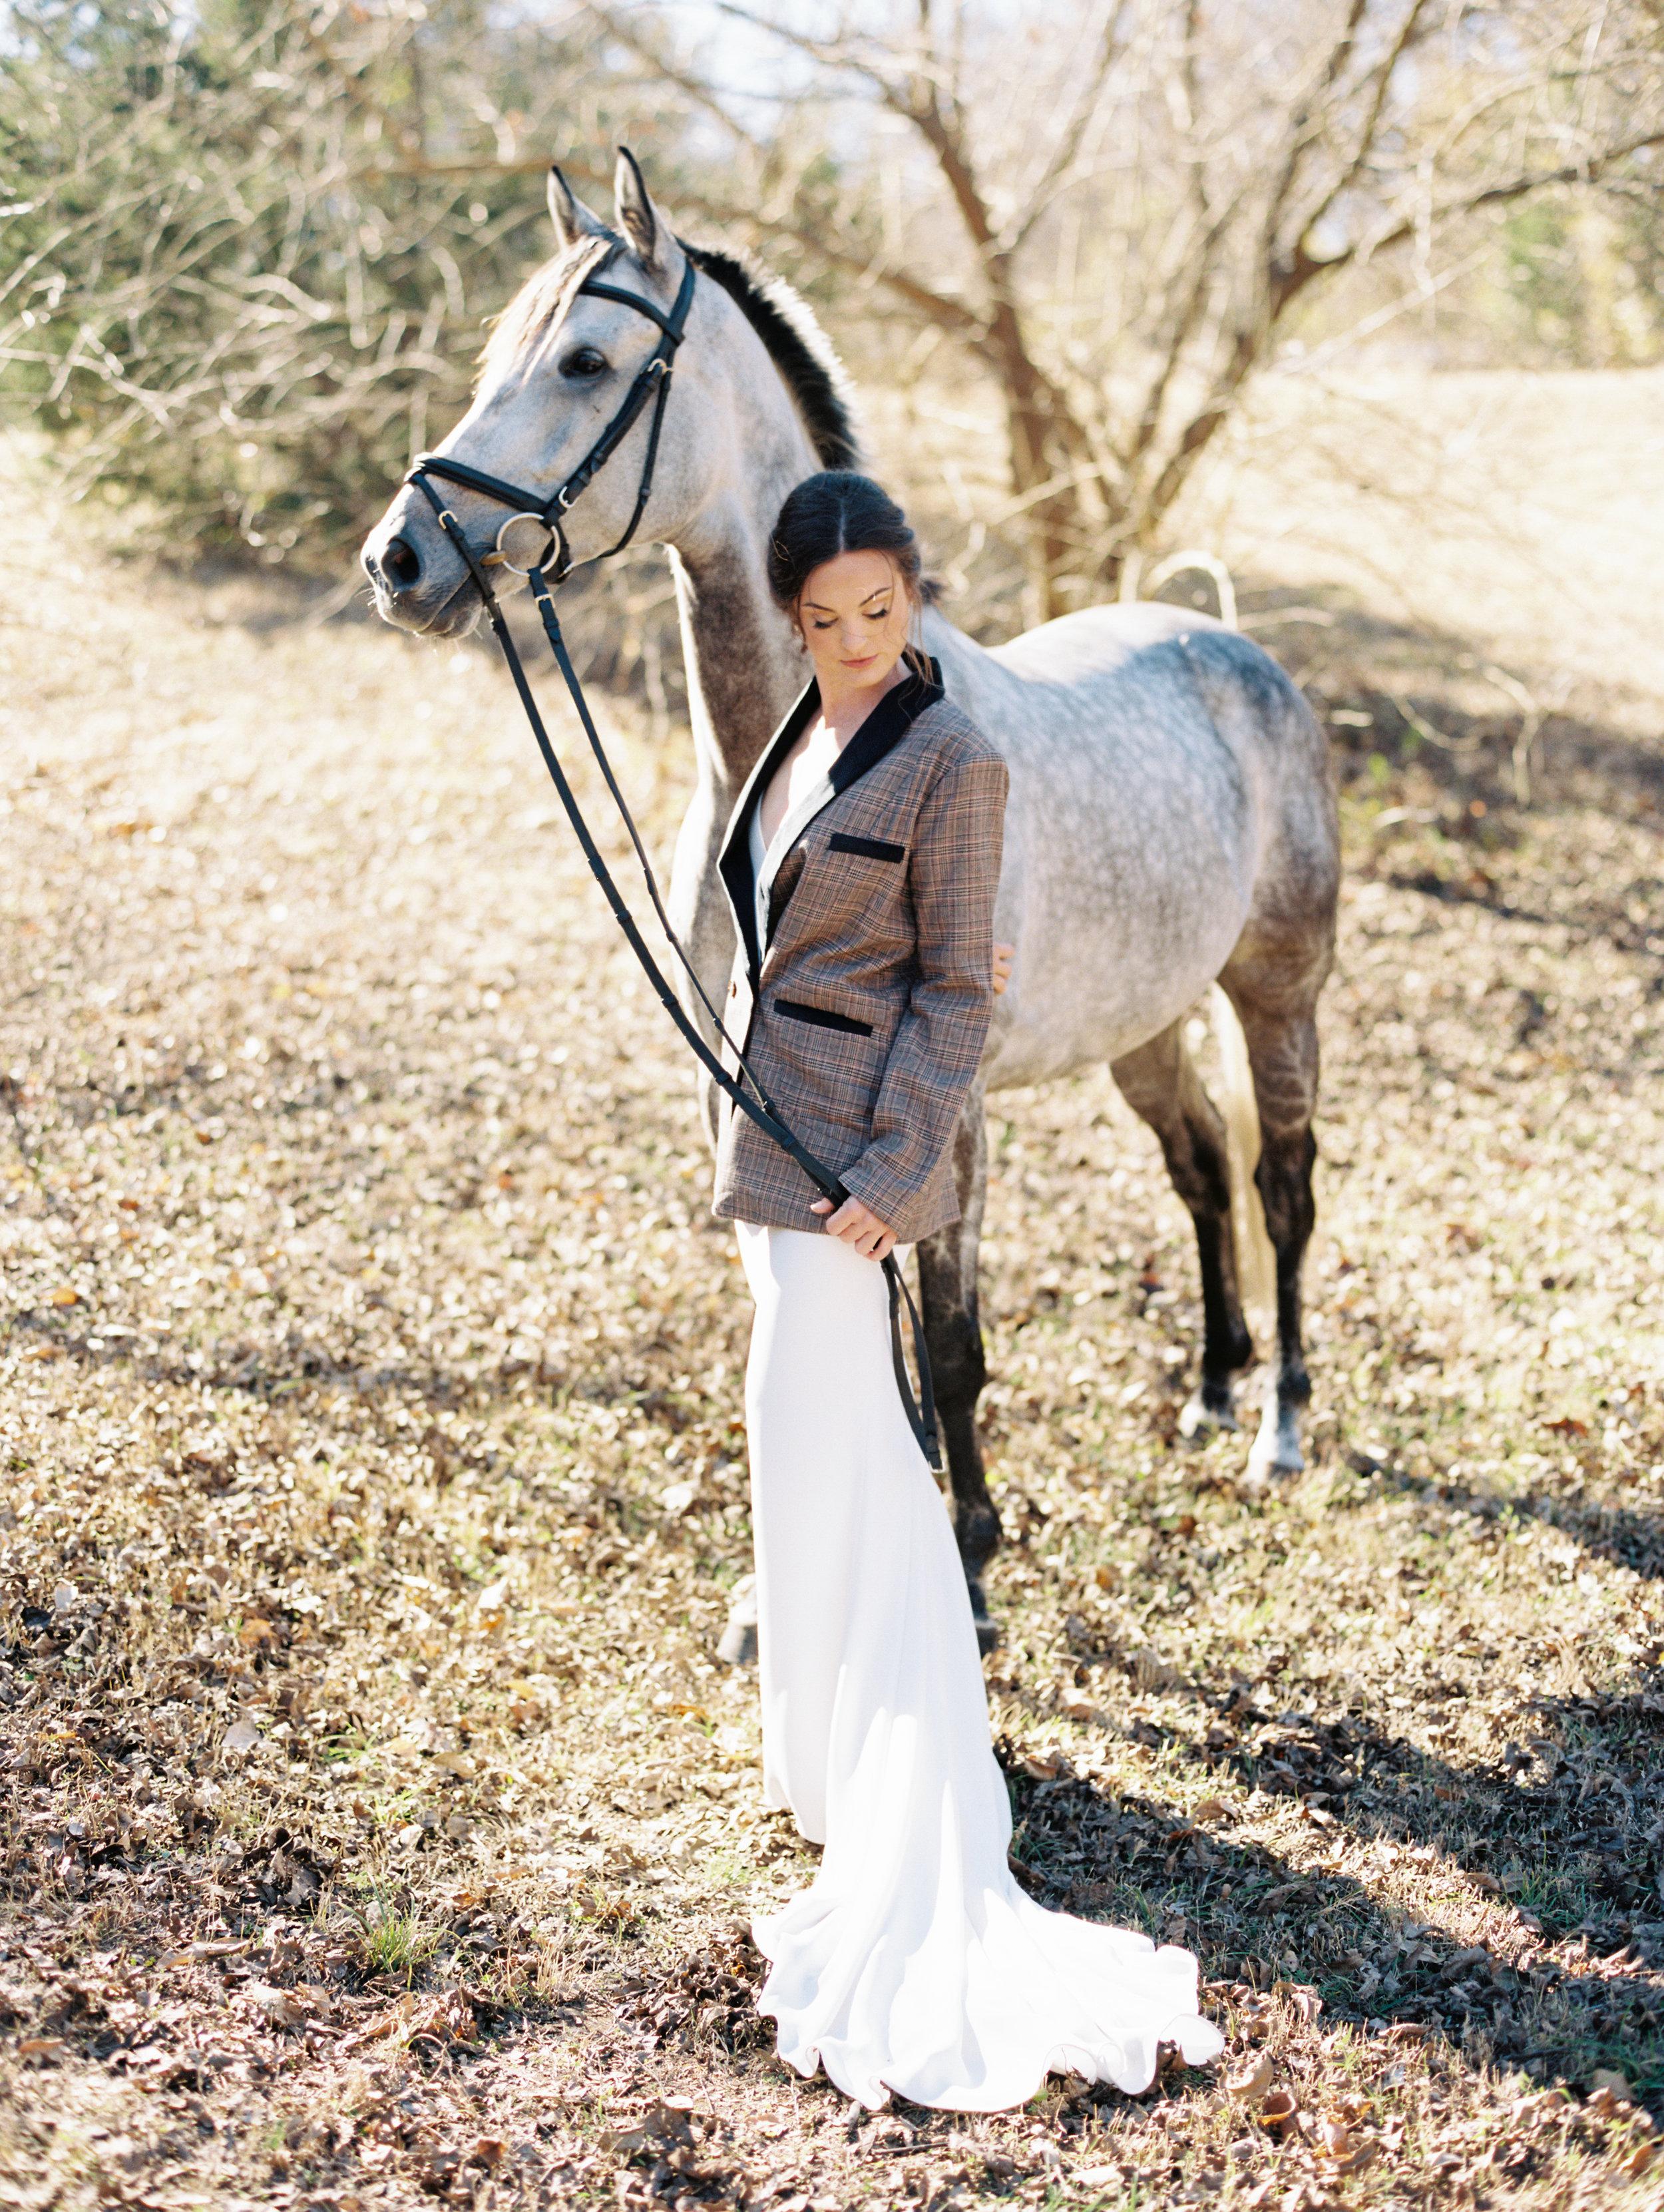 ralph-lauren-equestrian-styled-shoot-ar-photography-132.jpg